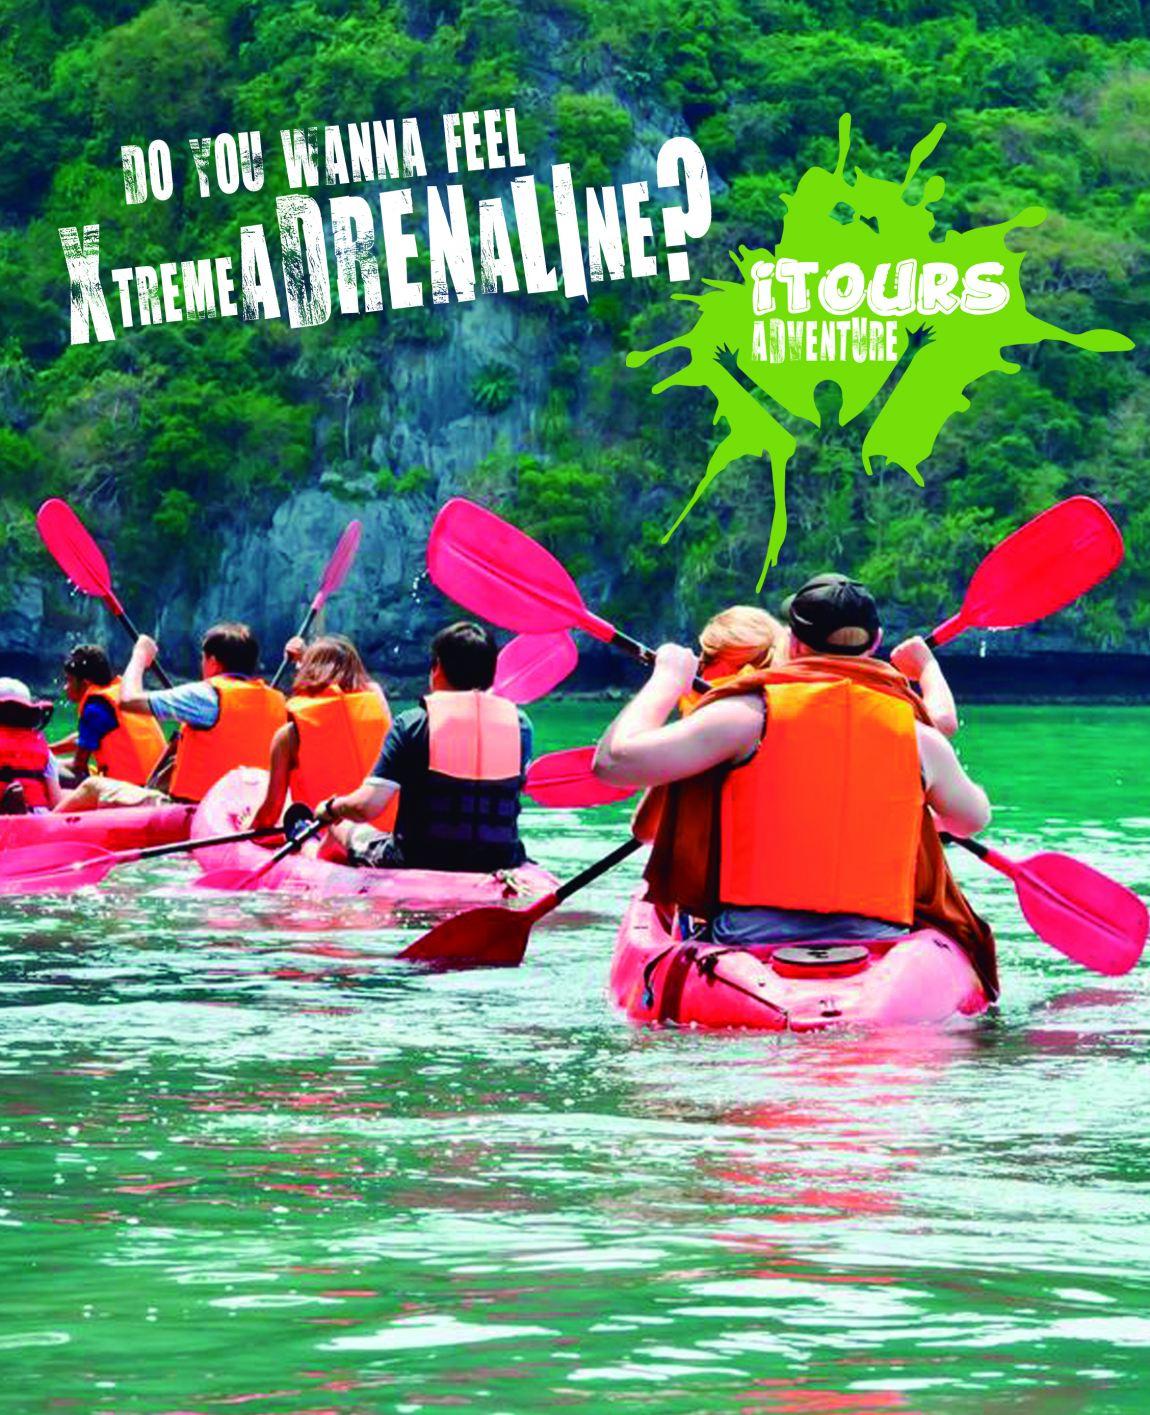 Foto Itours, ¡la aventura sobre el kayak!